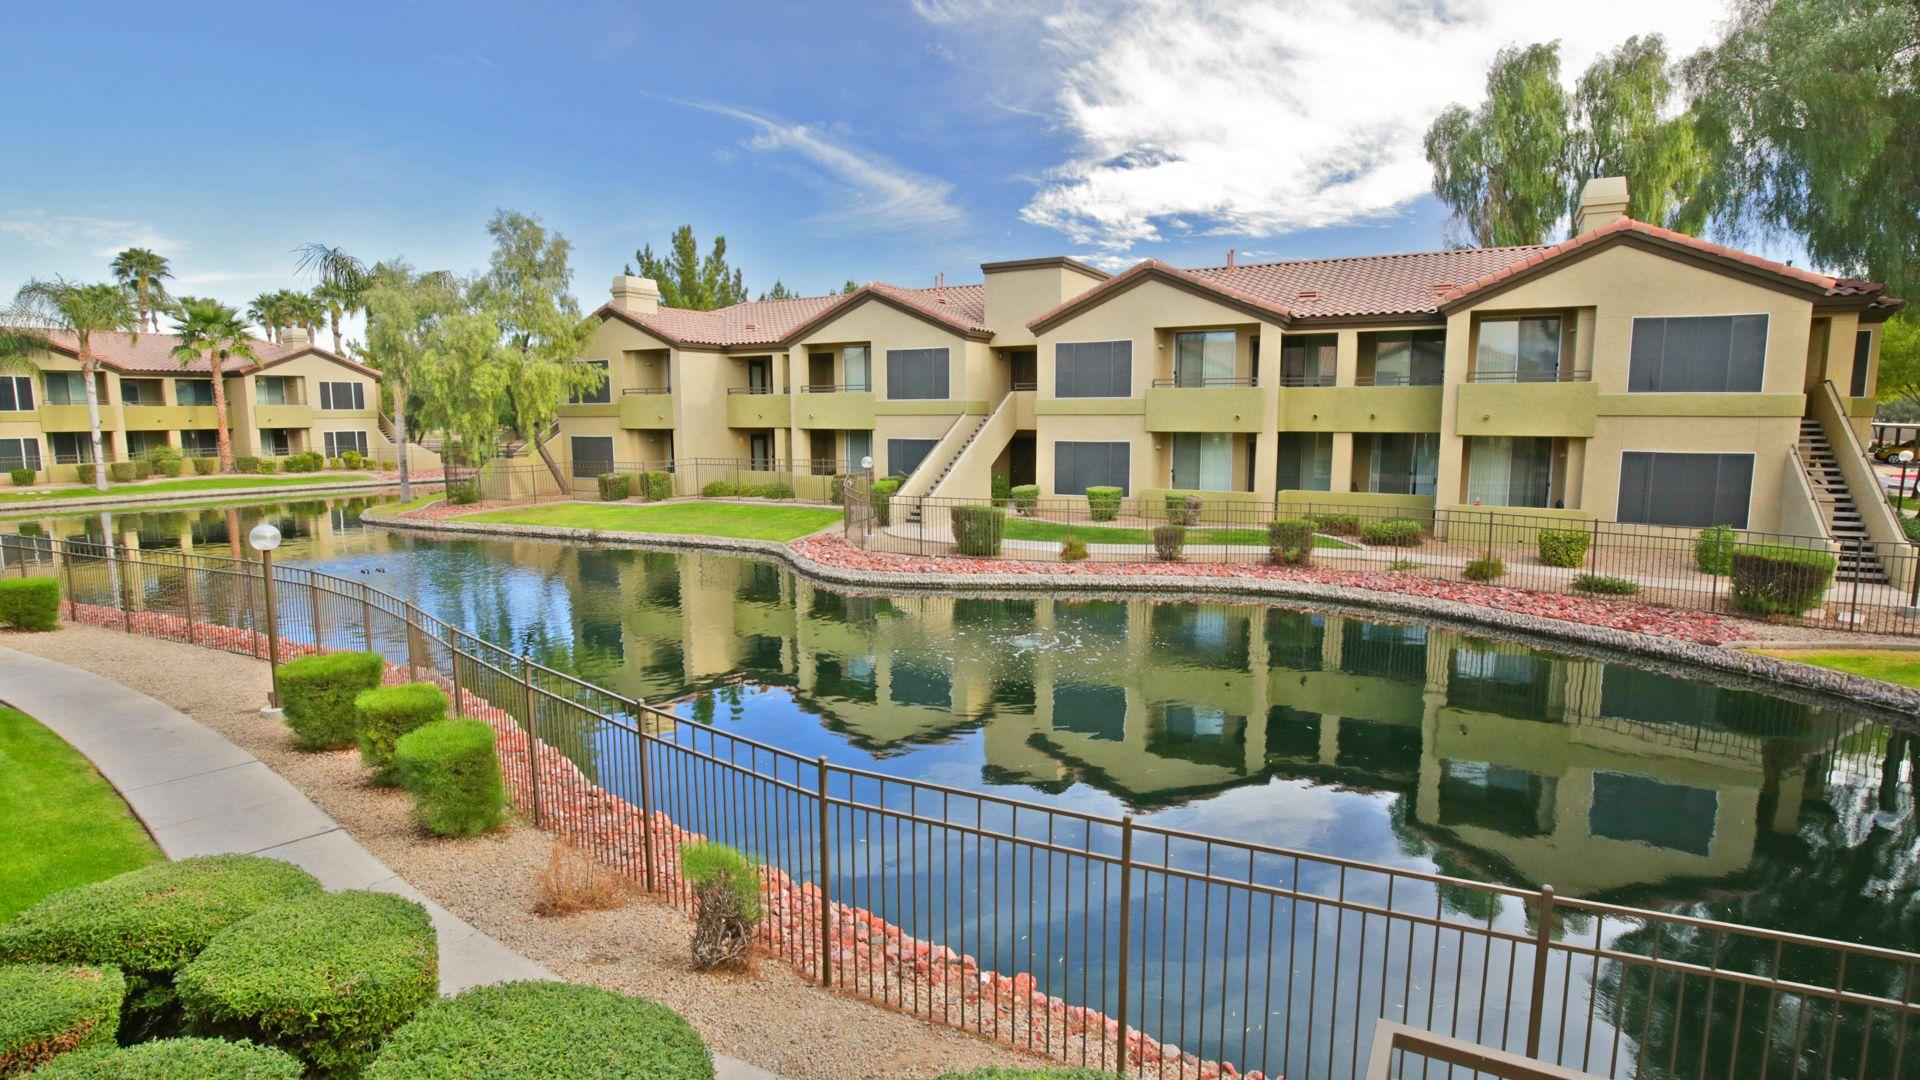 Isle at Arrowhead Ranch Apartments - Pond